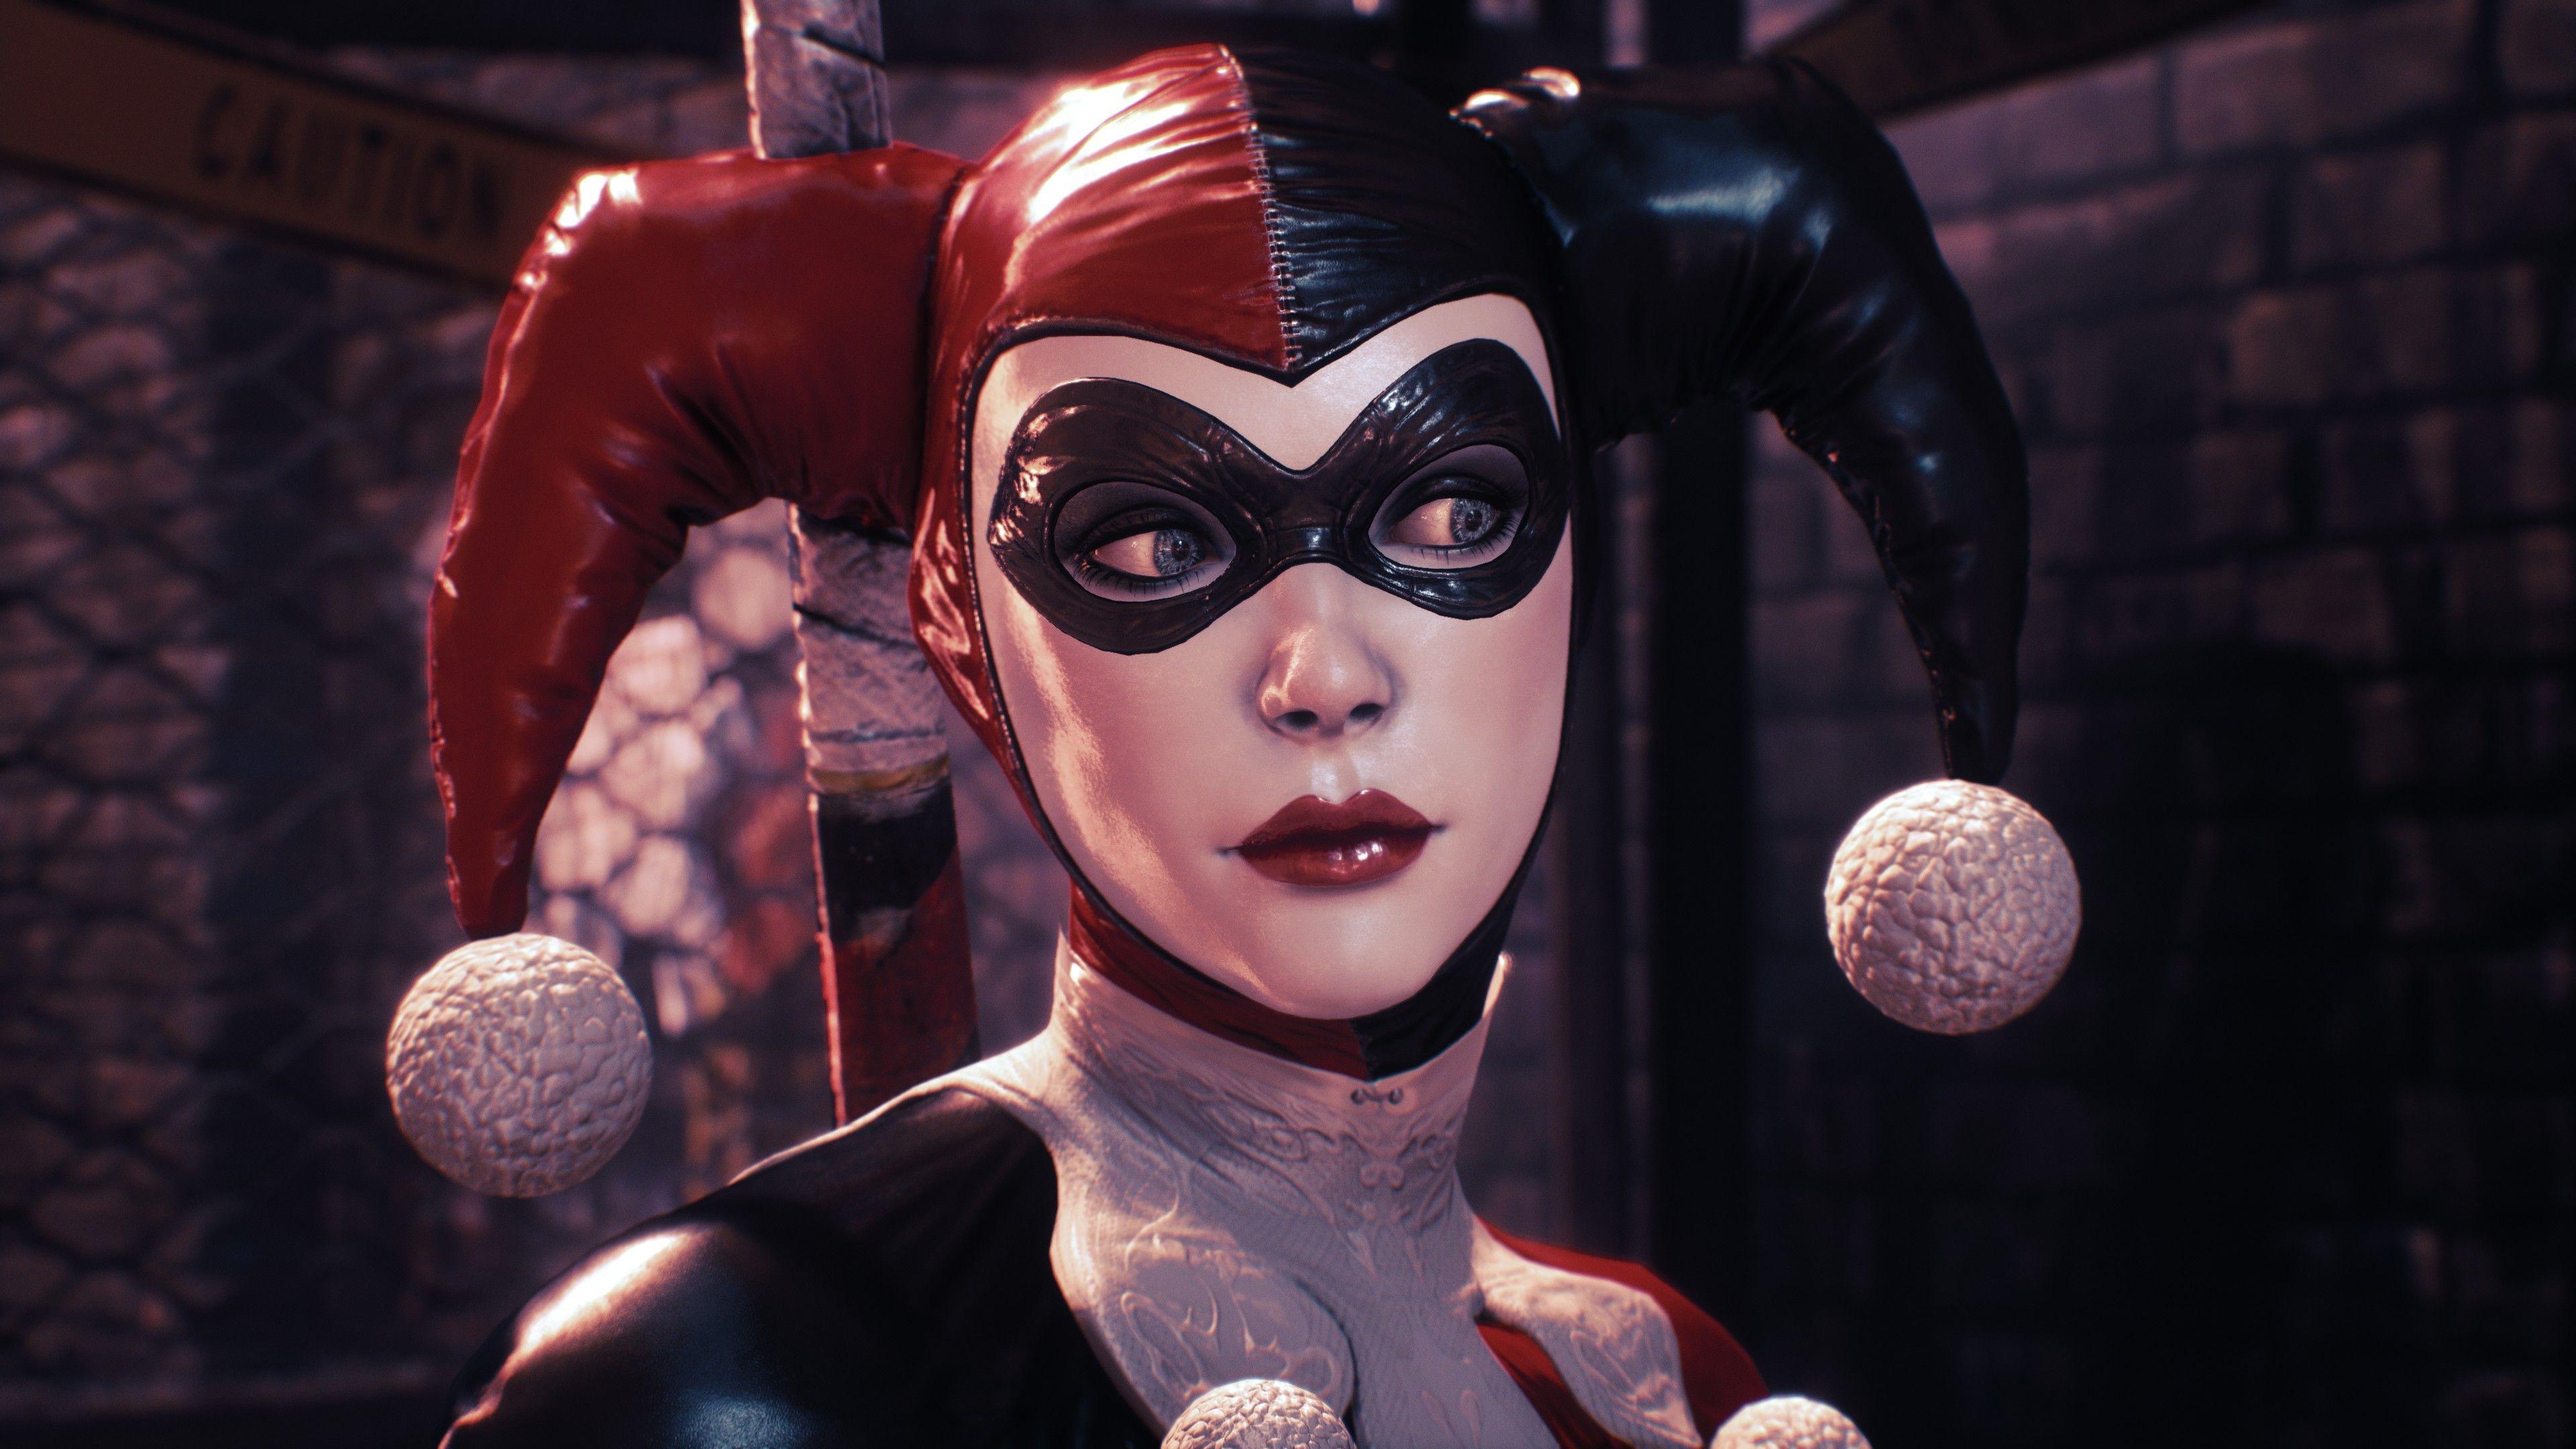 4k Harley Quinn Wallpapers Top Free 4k Harley Quinn Backgrounds